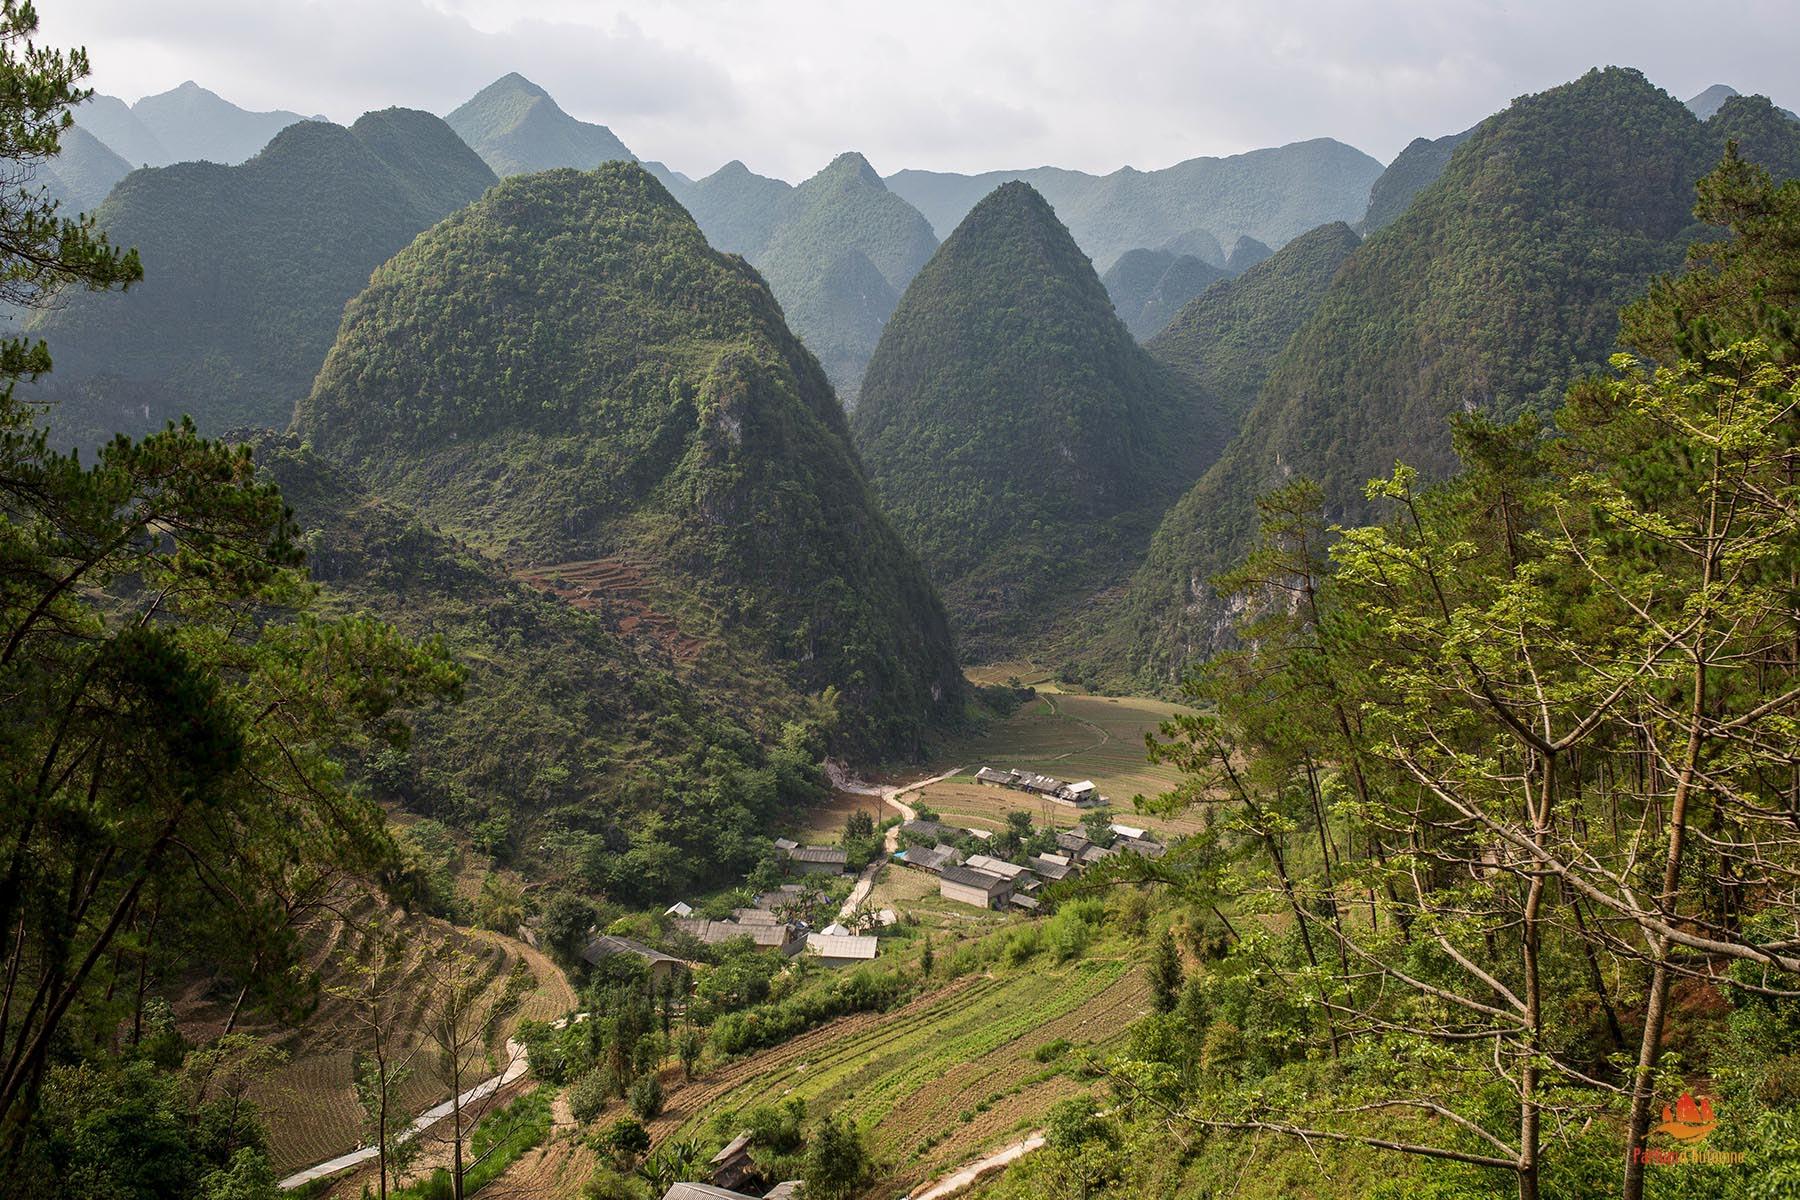 Montagnes de la province de Ha Giang, Vietnam